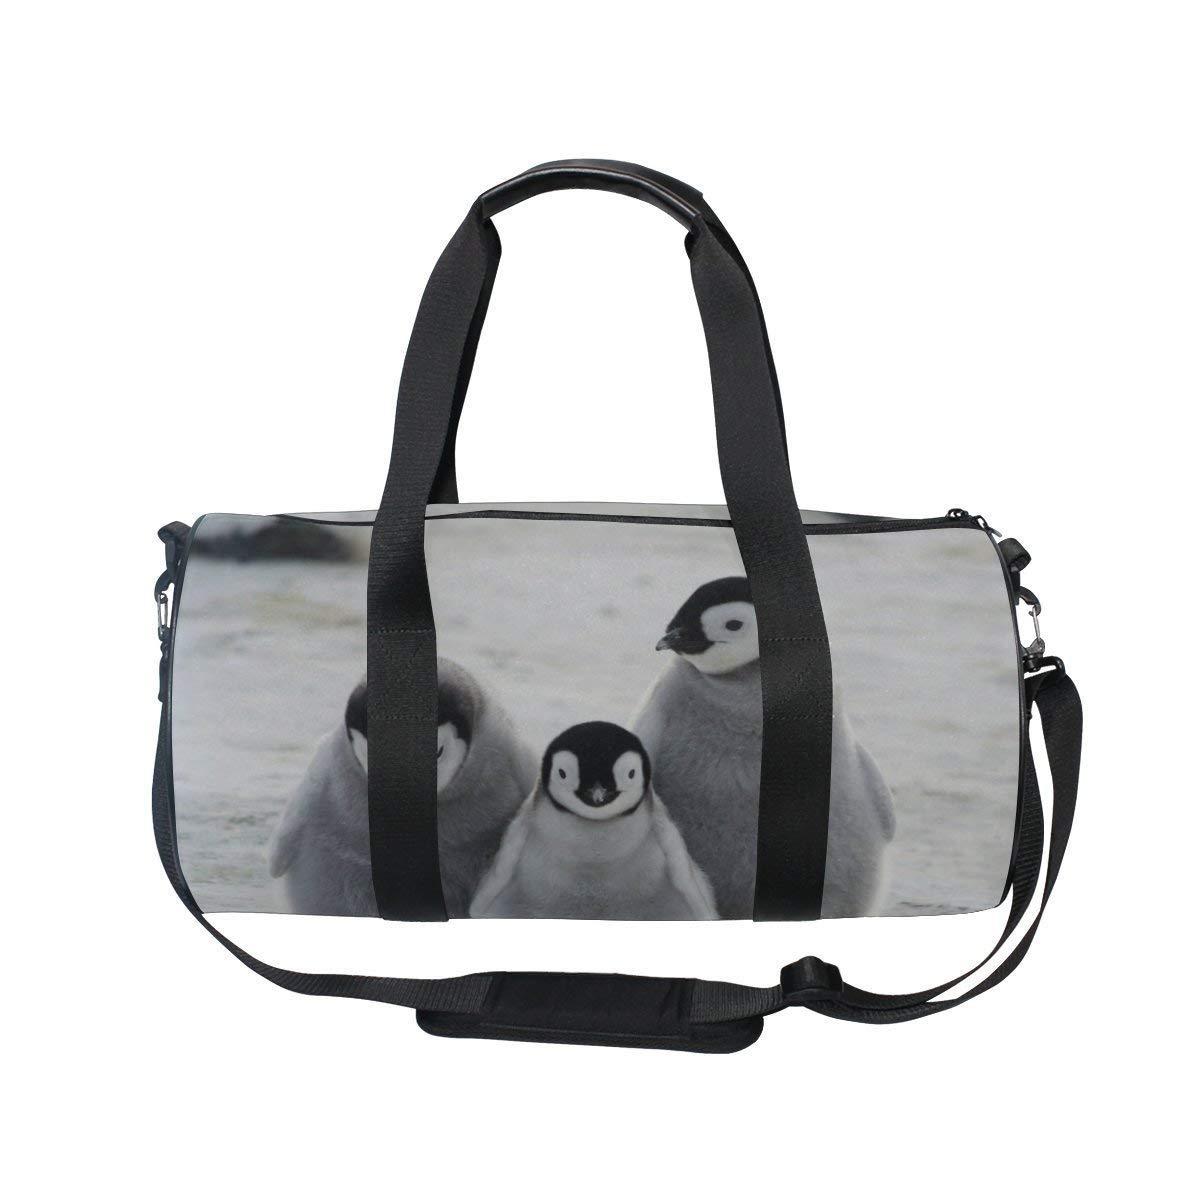 6ee7293ddcaf Cheap Mens Luggage Duffel Bags, find Mens Luggage Duffel Bags deals ...